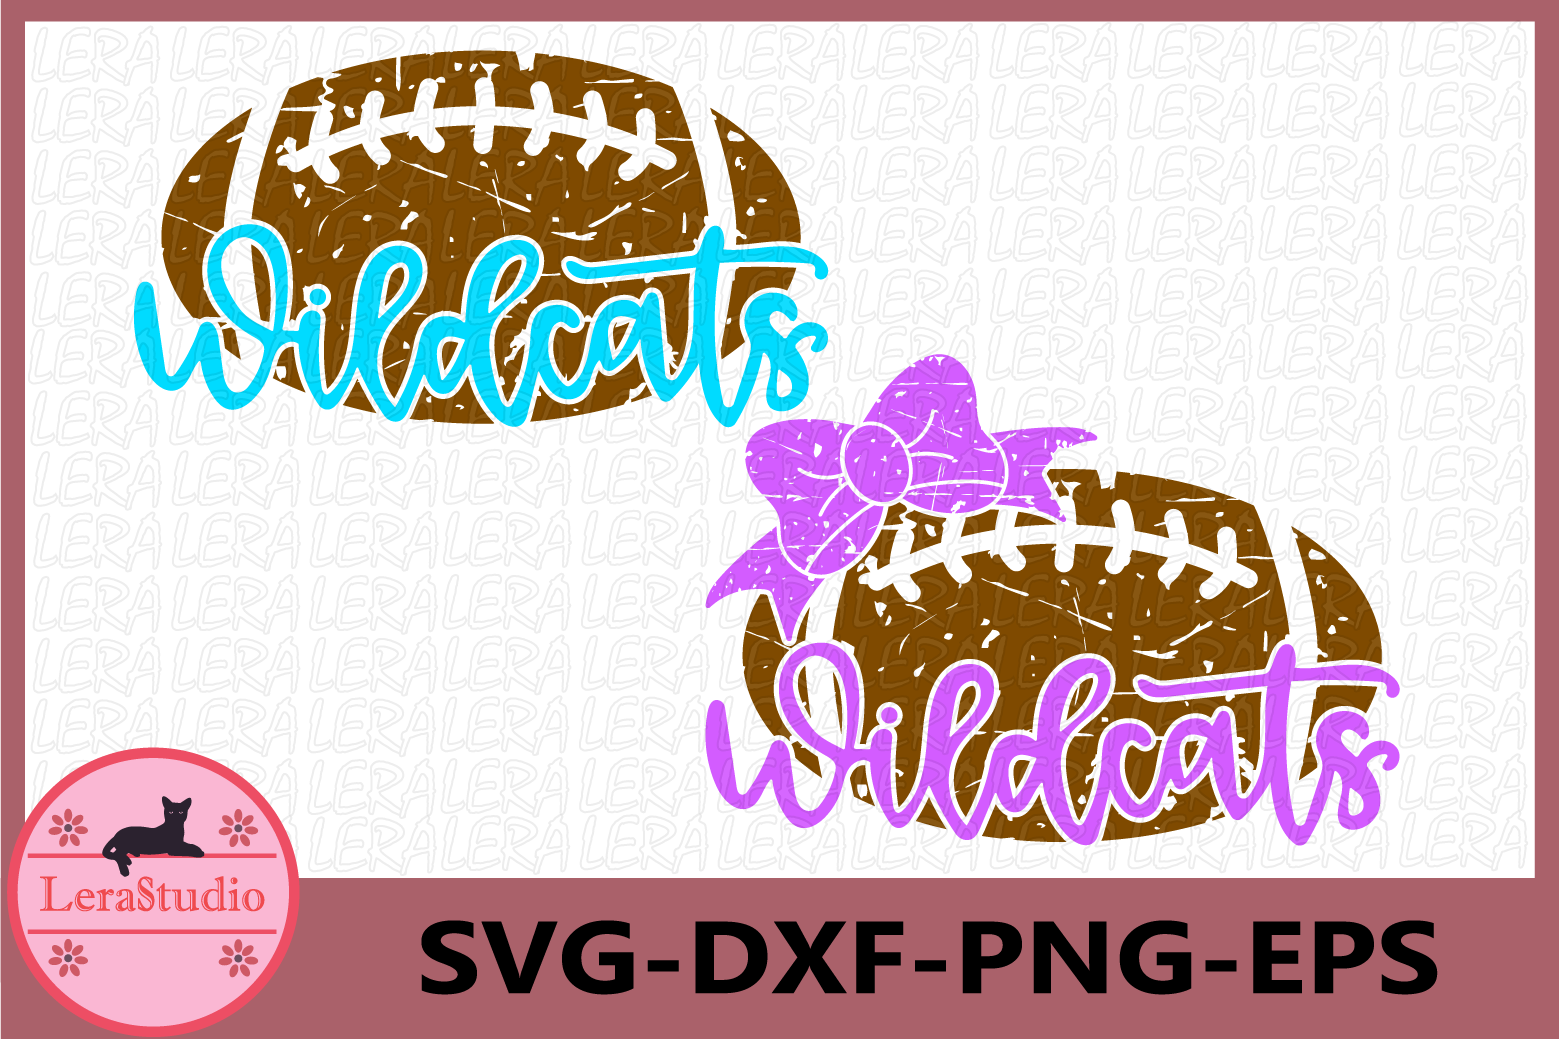 Wildcats Svg, Football Grunge SVG, Sport Ball Monogram svg example image 1